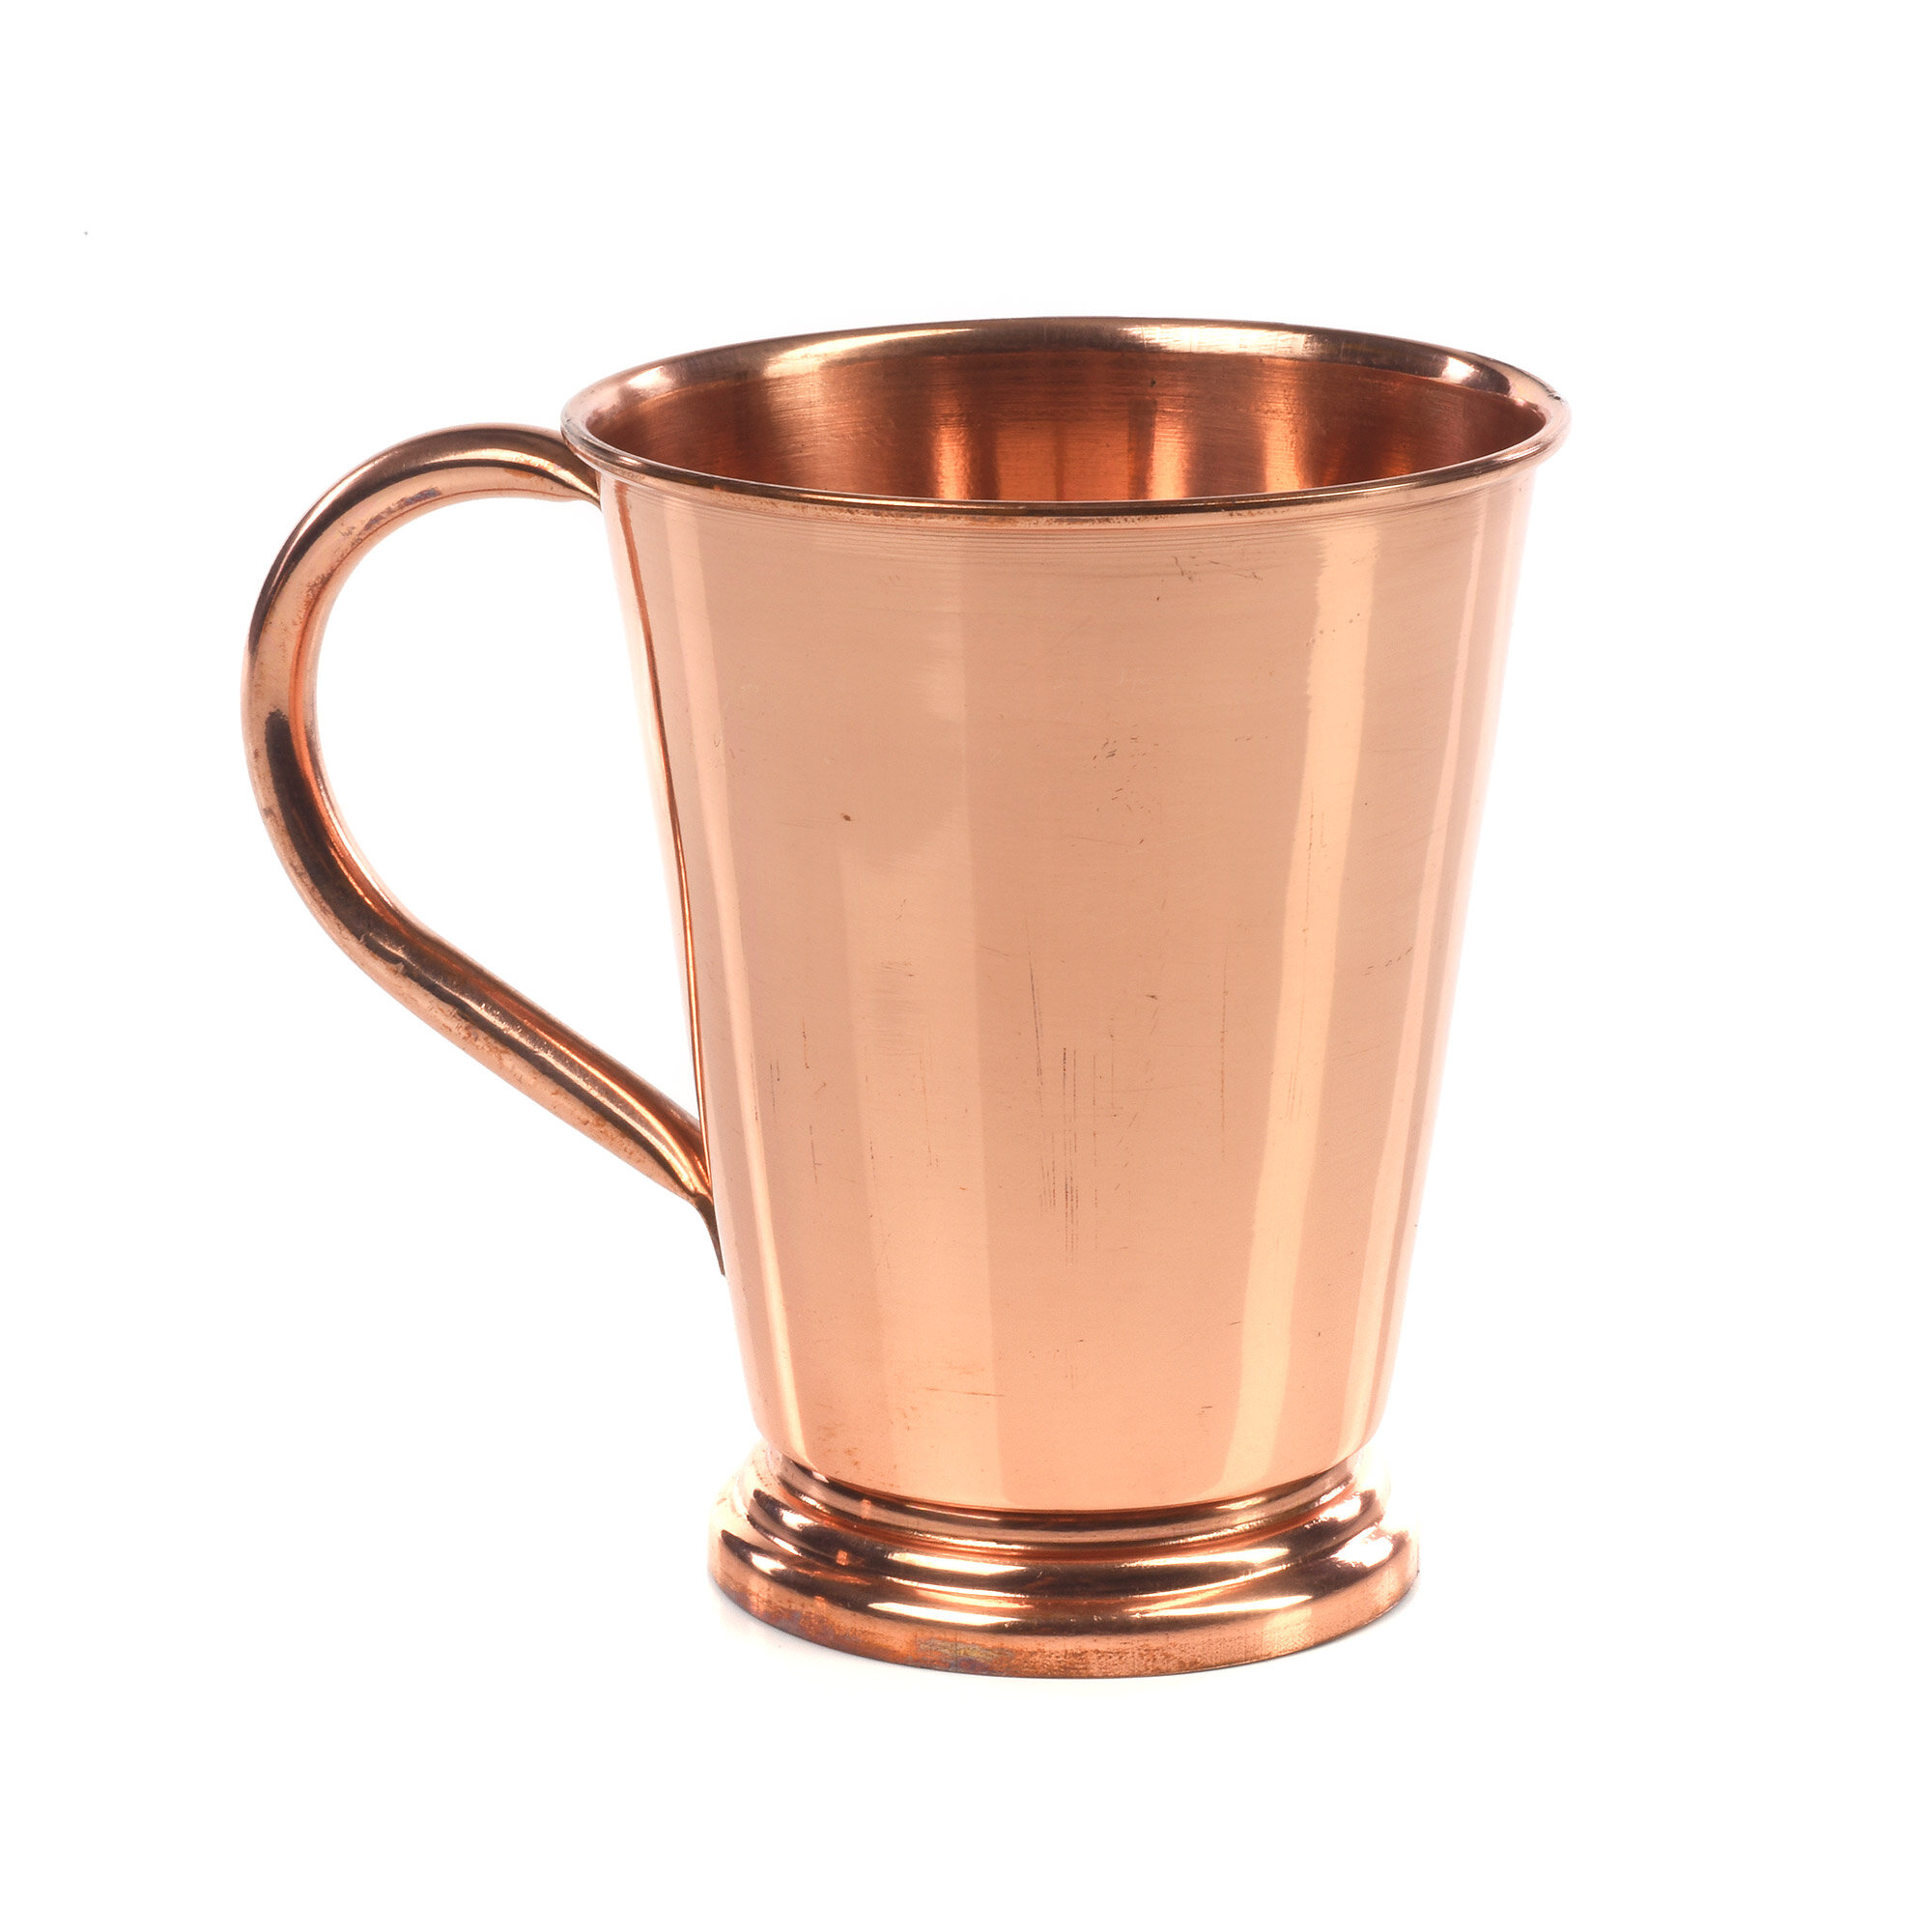 Ivy Bronx Andreana 12 Oz Copper Moscow Mule Mug Wayfair